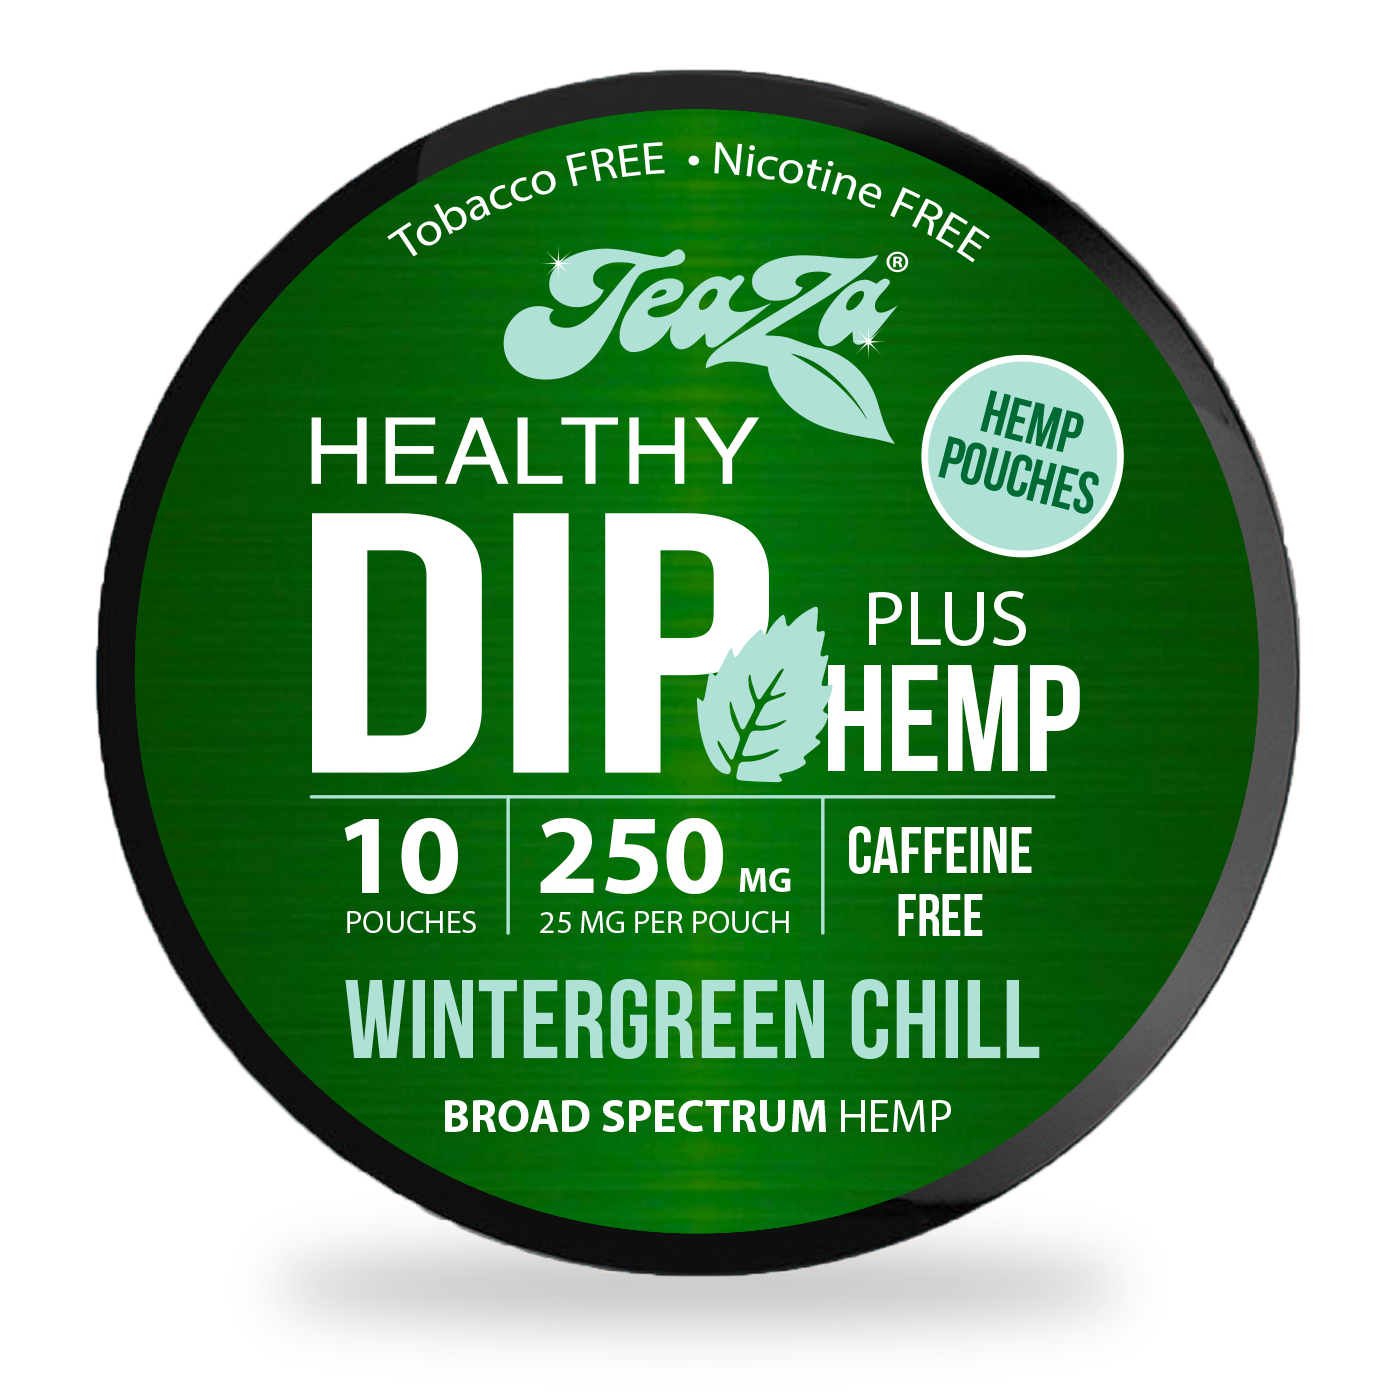 Wintergreen Chill Hemp Dip Pouches